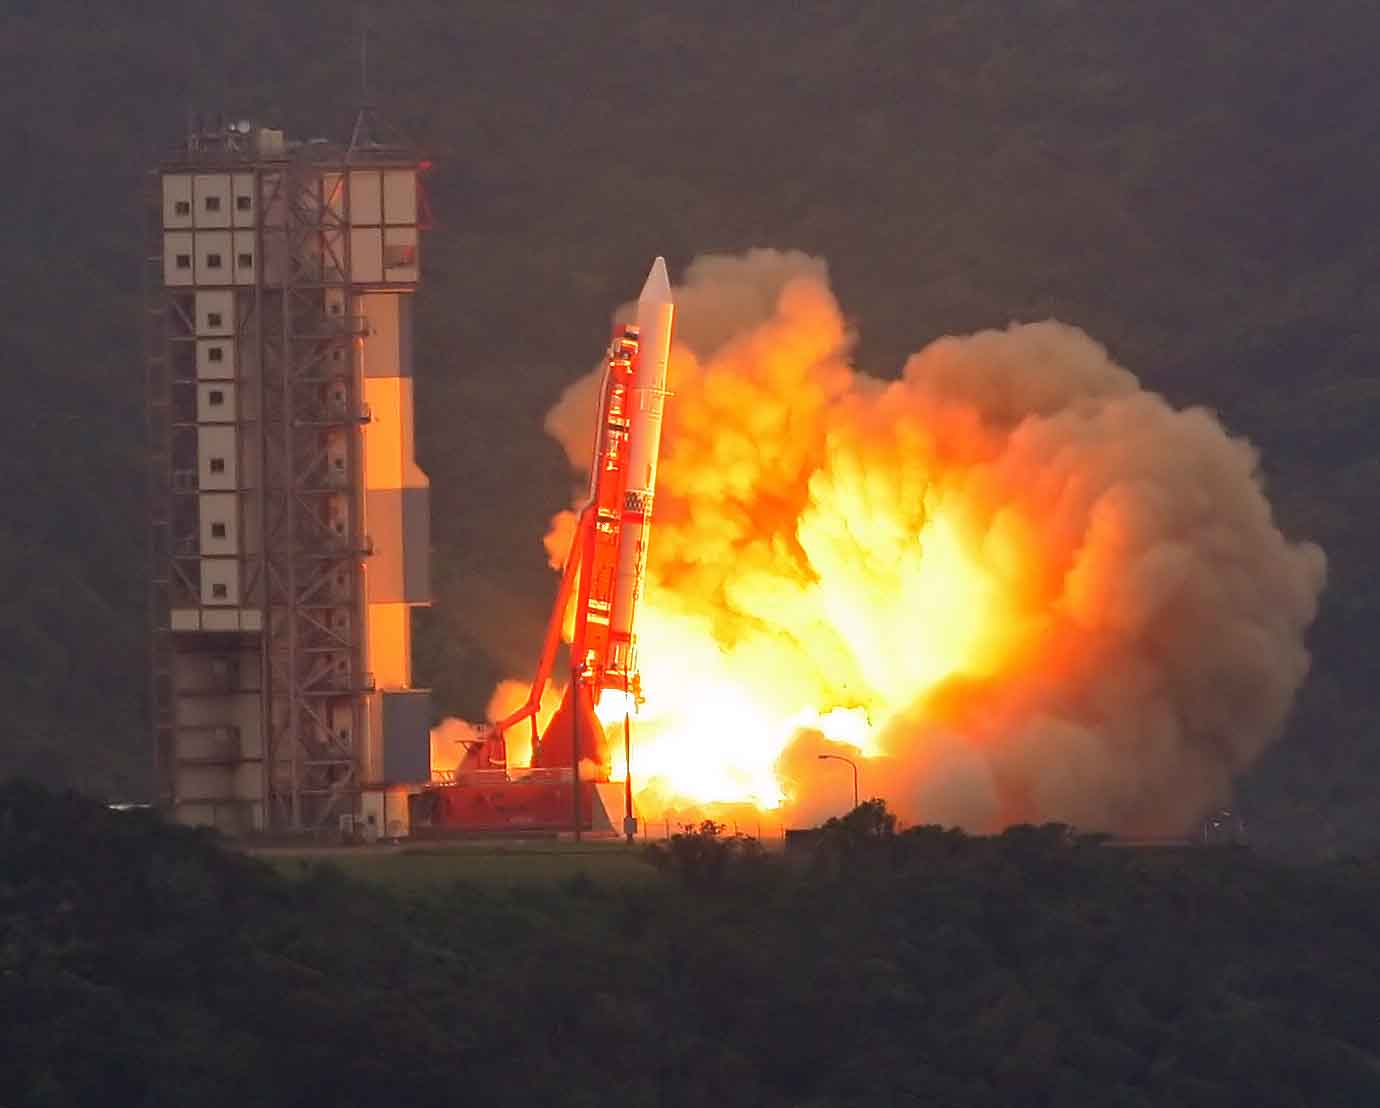 nasa space failures - photo #8